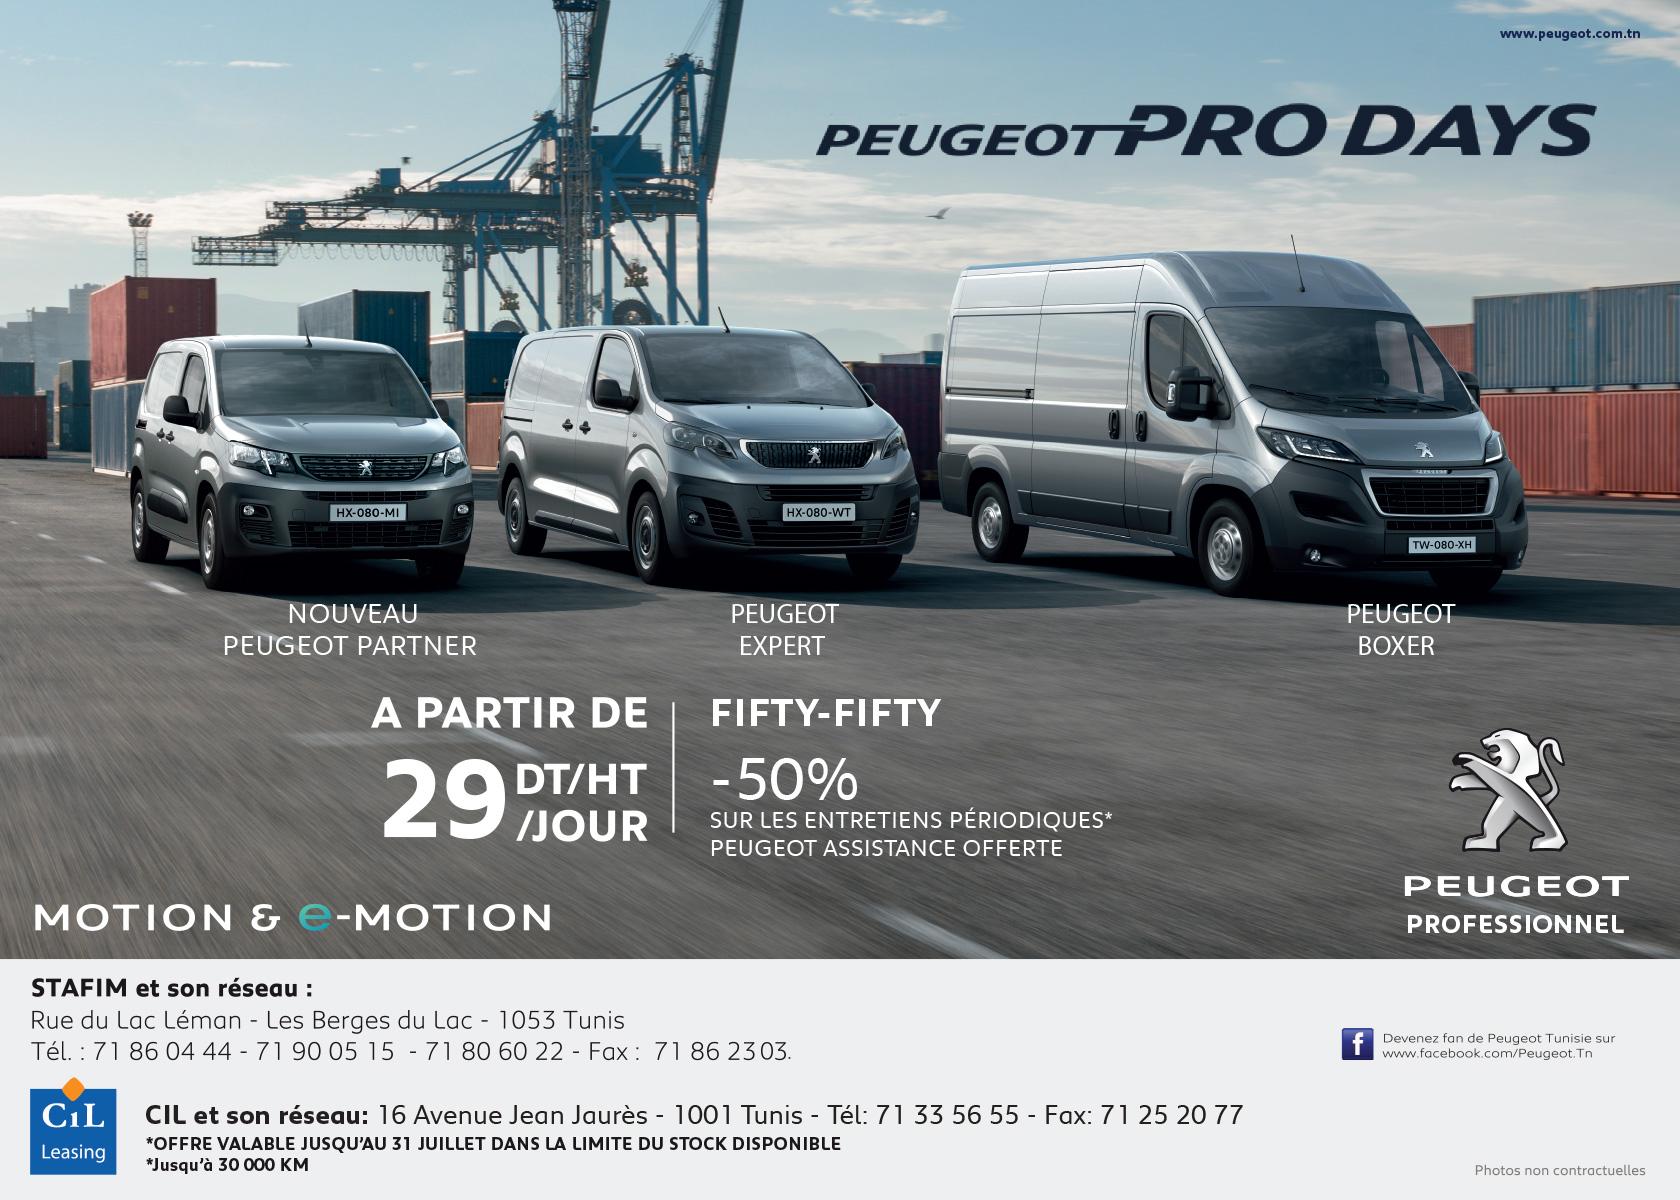 Peugeot Driving Nights